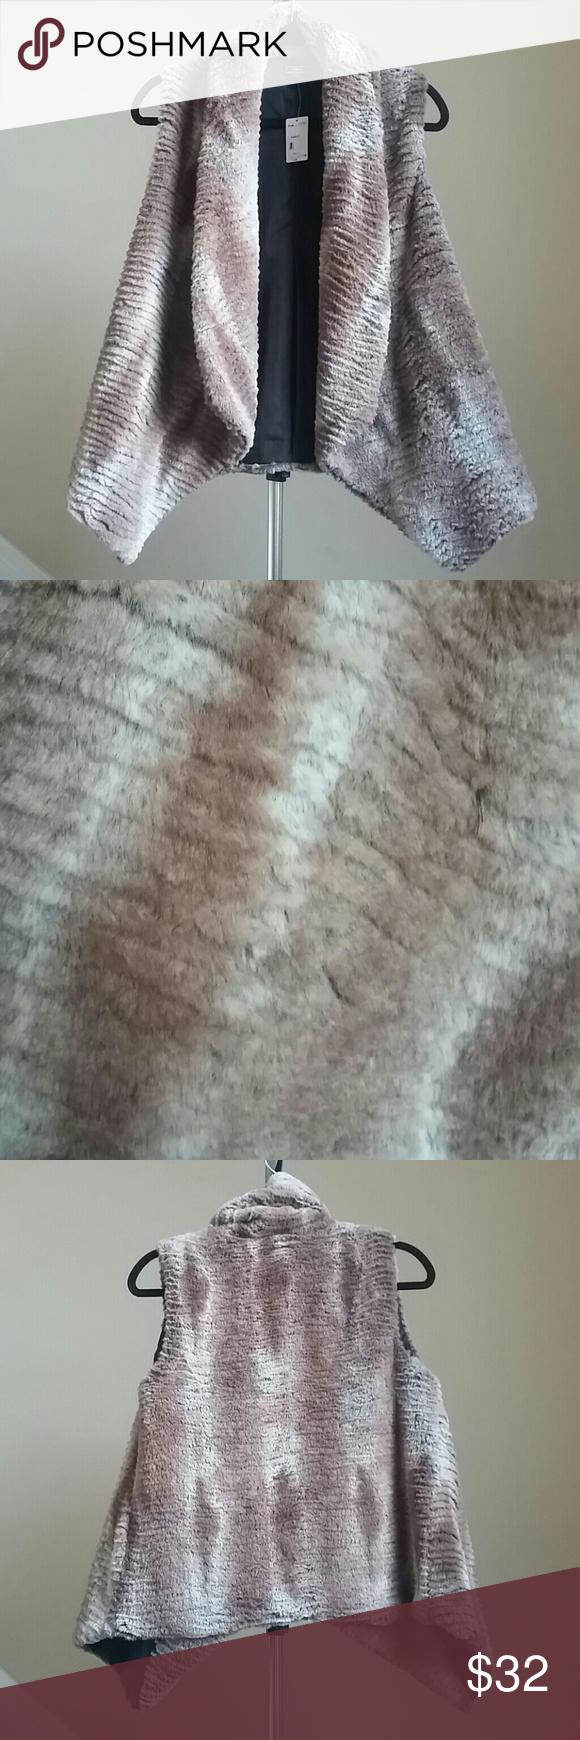 🆕Lisa International Faux Fur Vest Super cute and soft faux fur vest by Lisa International. Lined. Shell and Lining 100% Polyester. 🚨Price Firm!🚨 Lisa International Jackets & Coats Vests